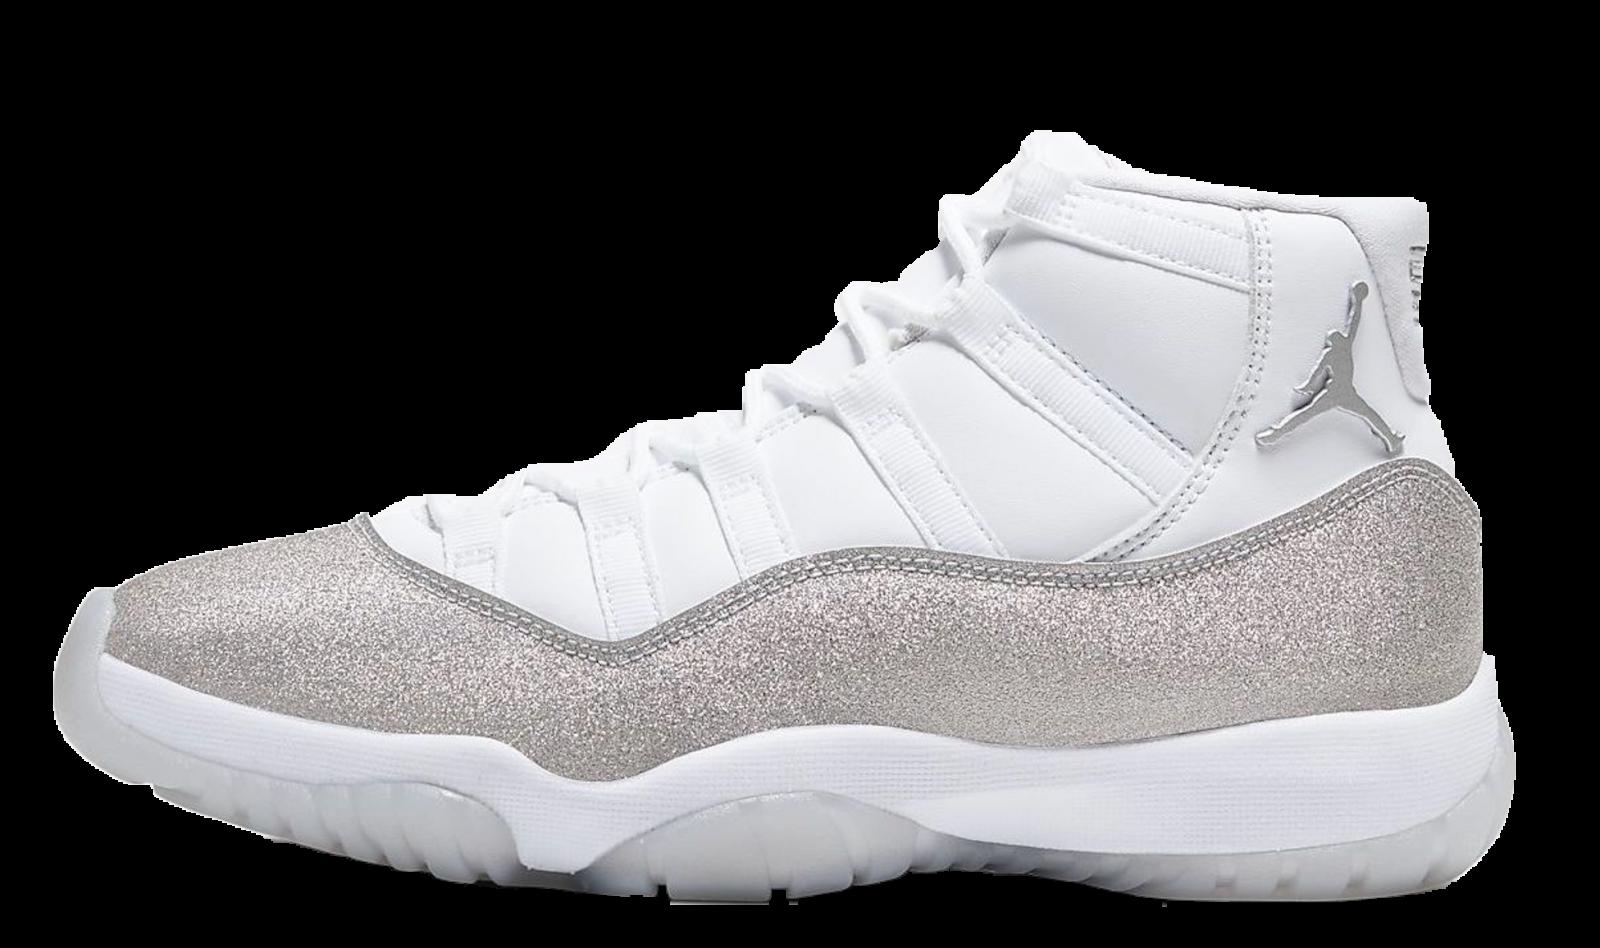 Air Jordan 11 Retro White Metallic Silver | AR0715-100